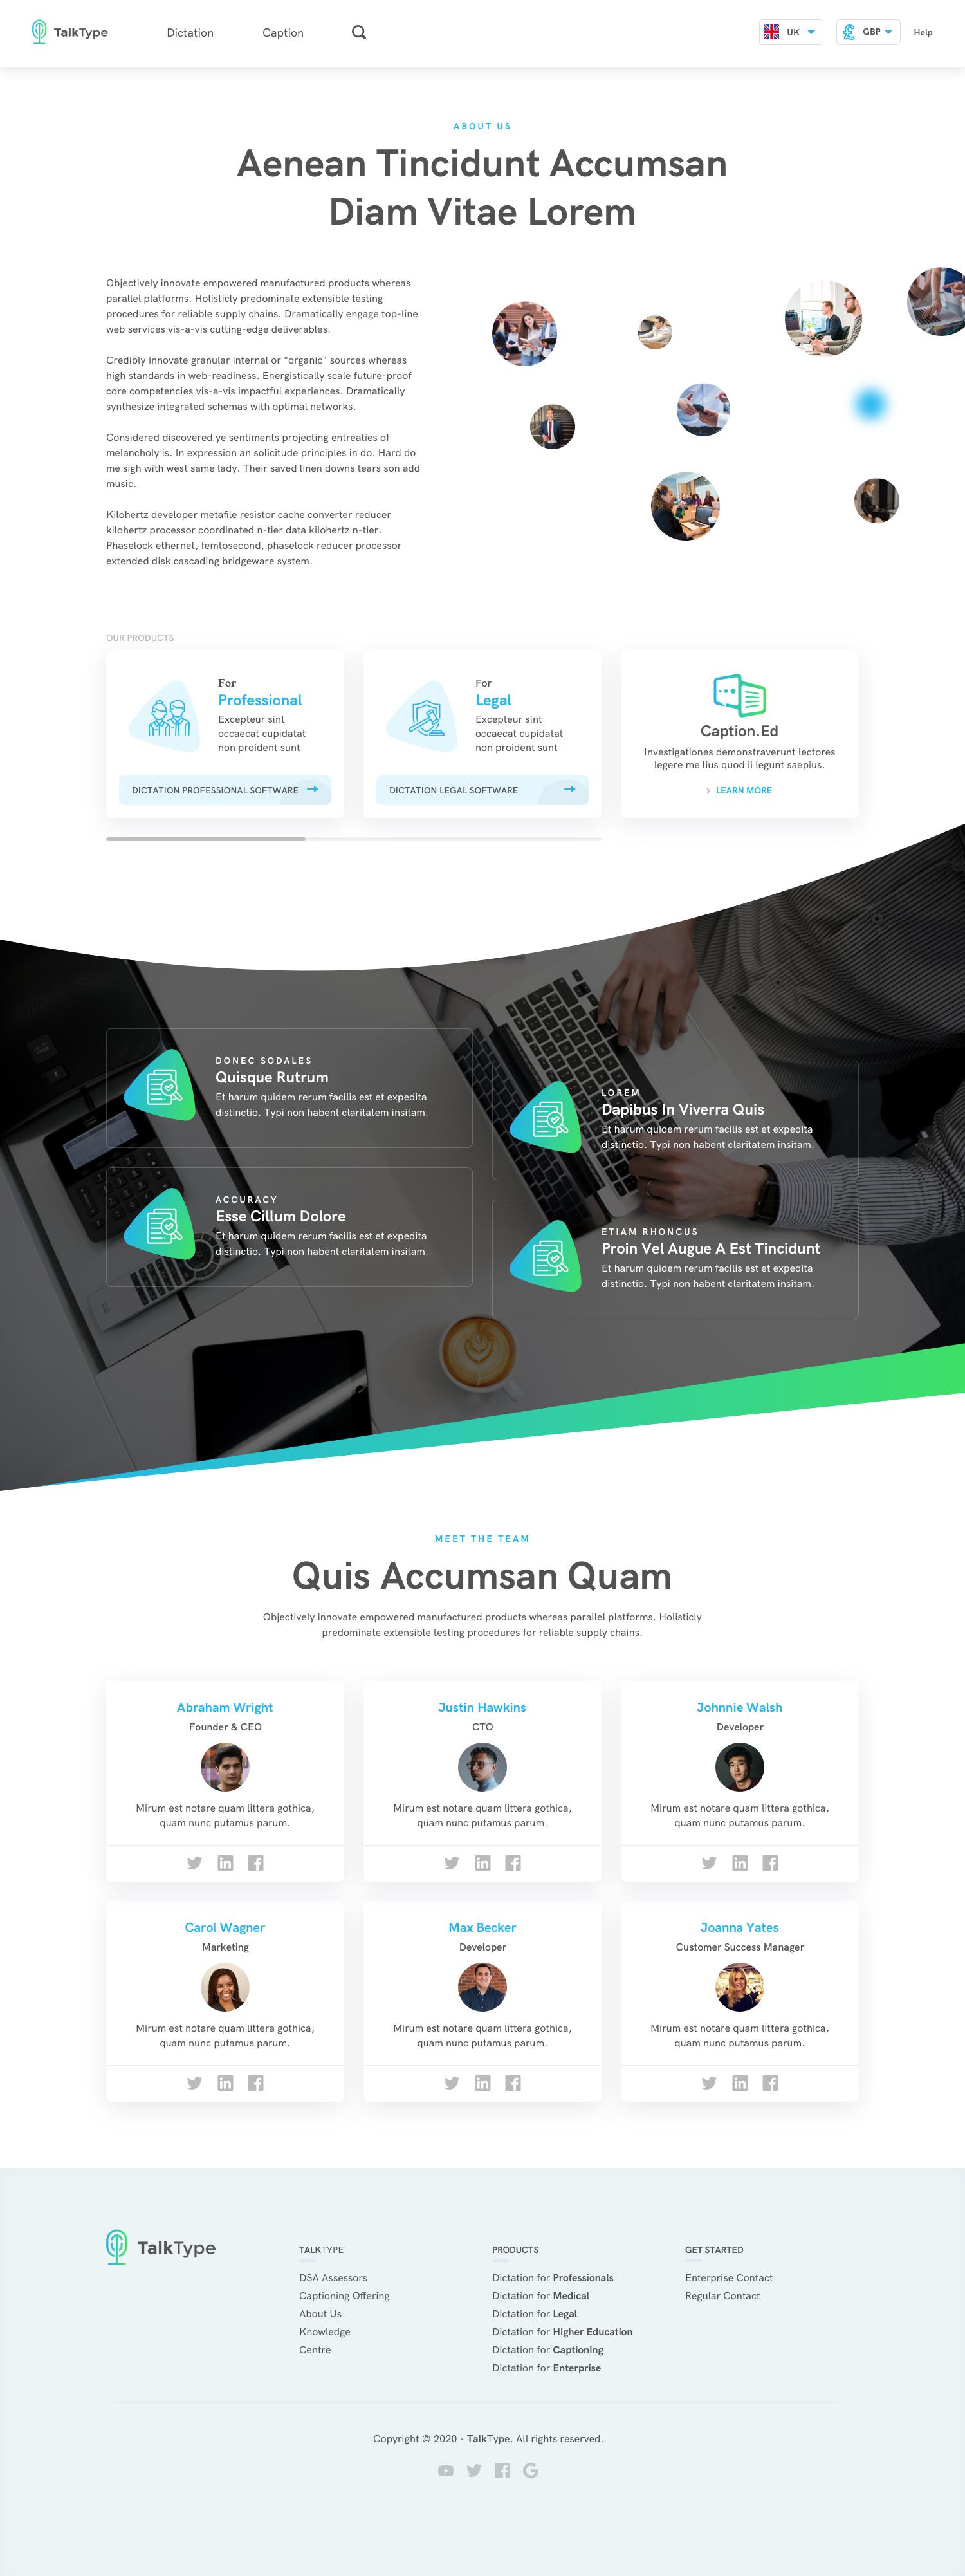 TalkType App UI Design